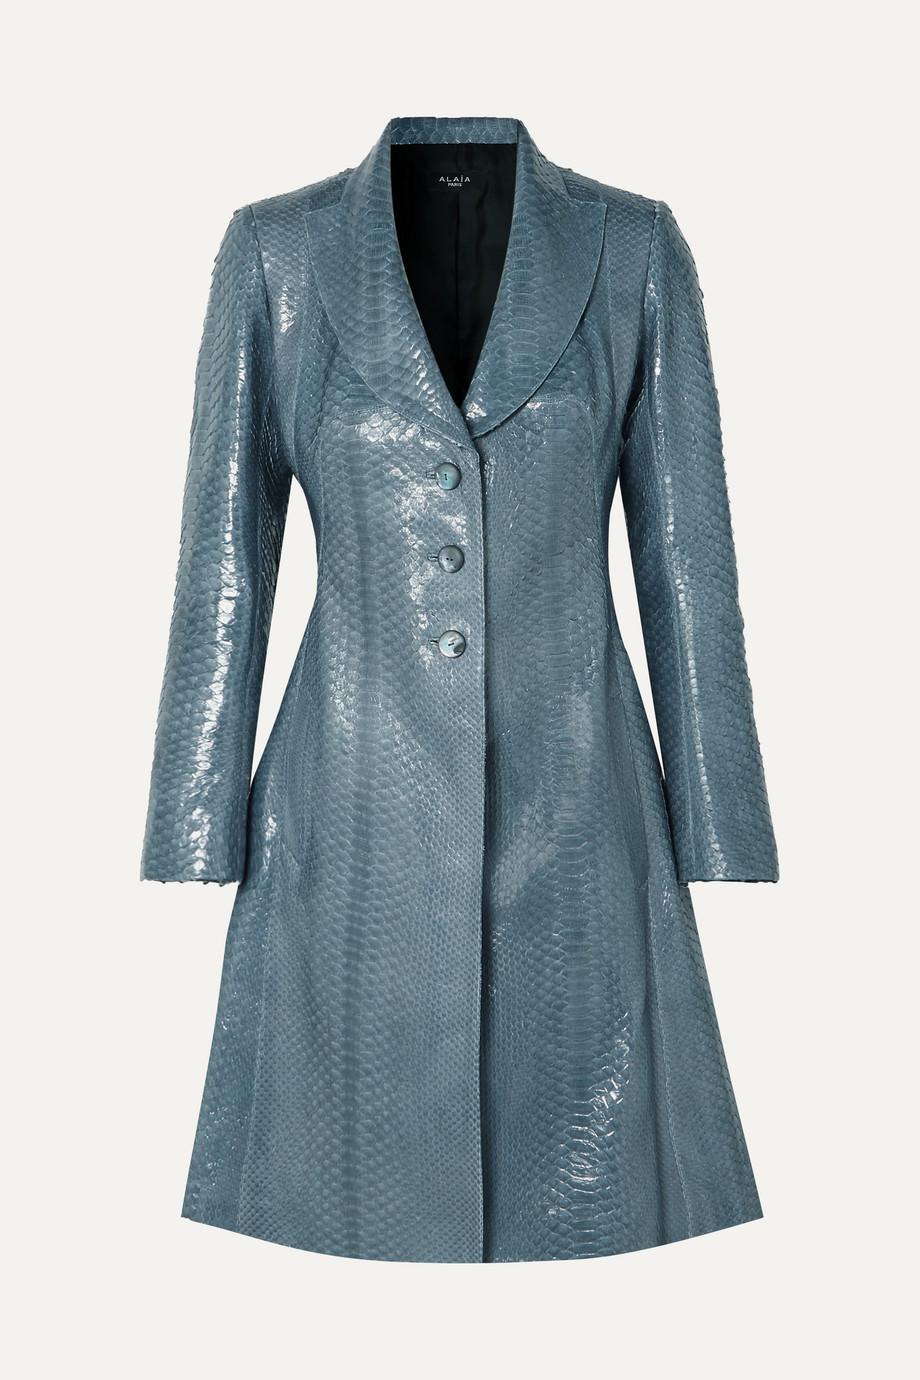 Alaïa Python coat